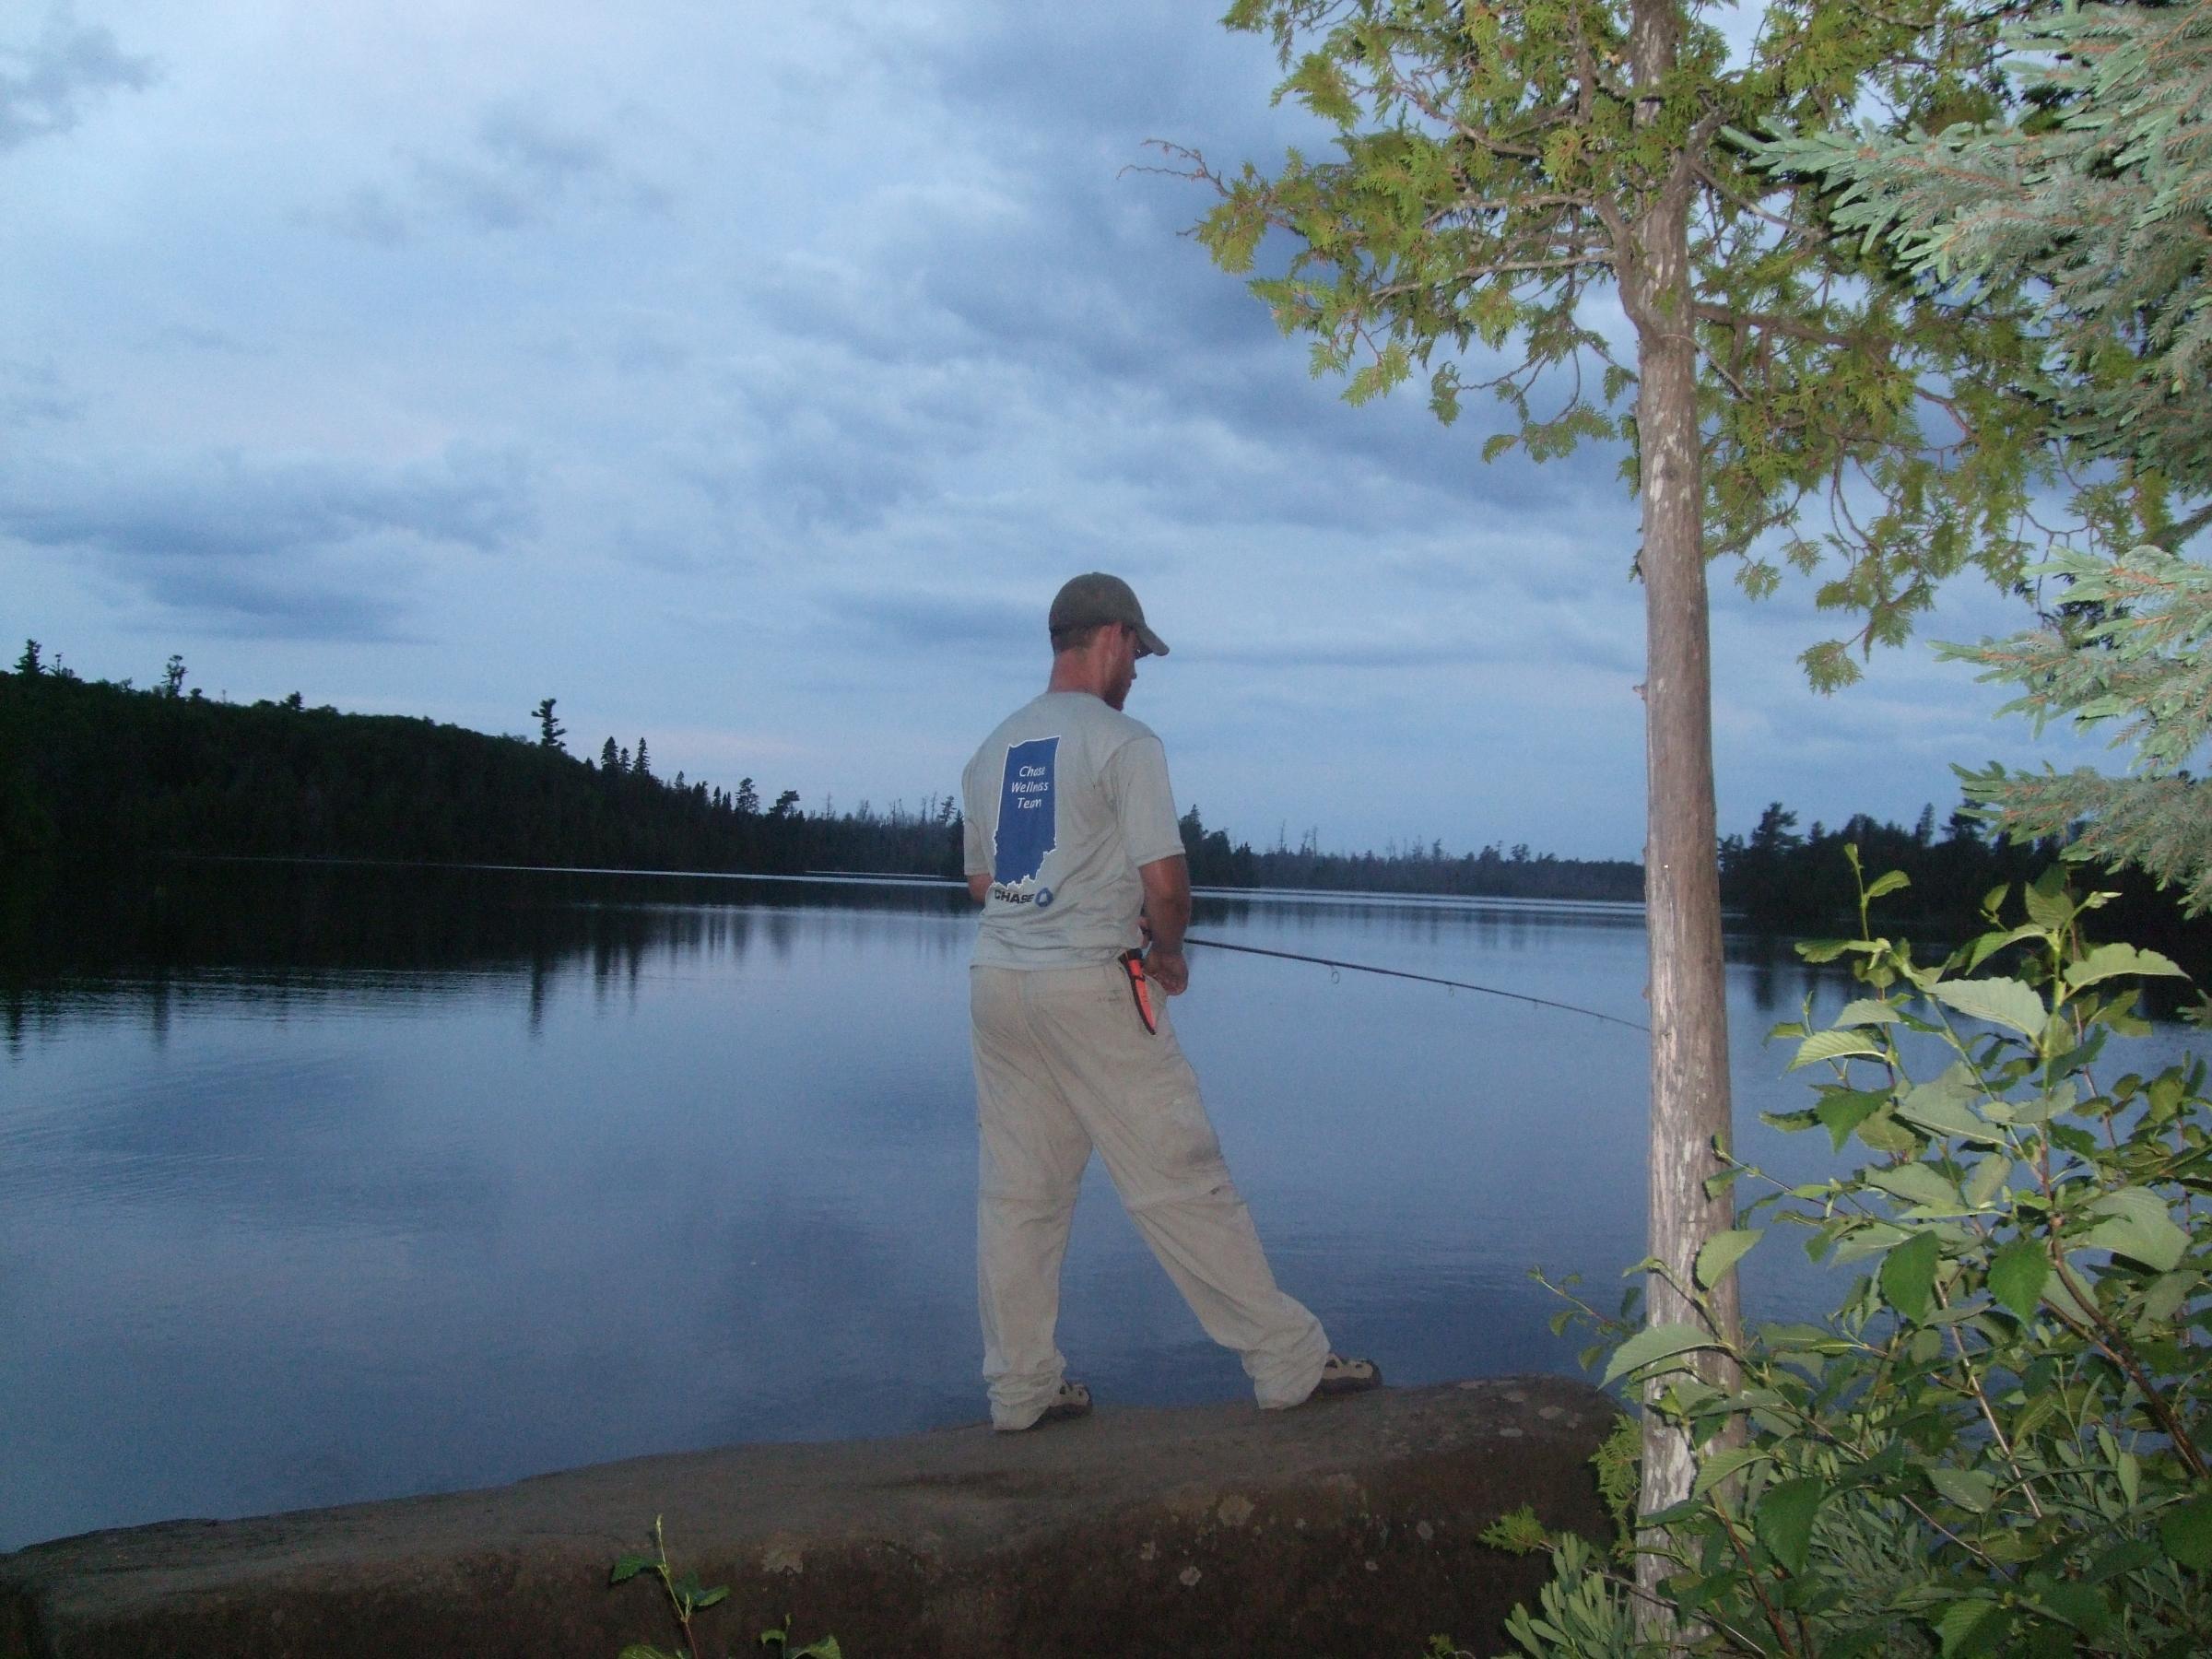 Fishing on Gaskin